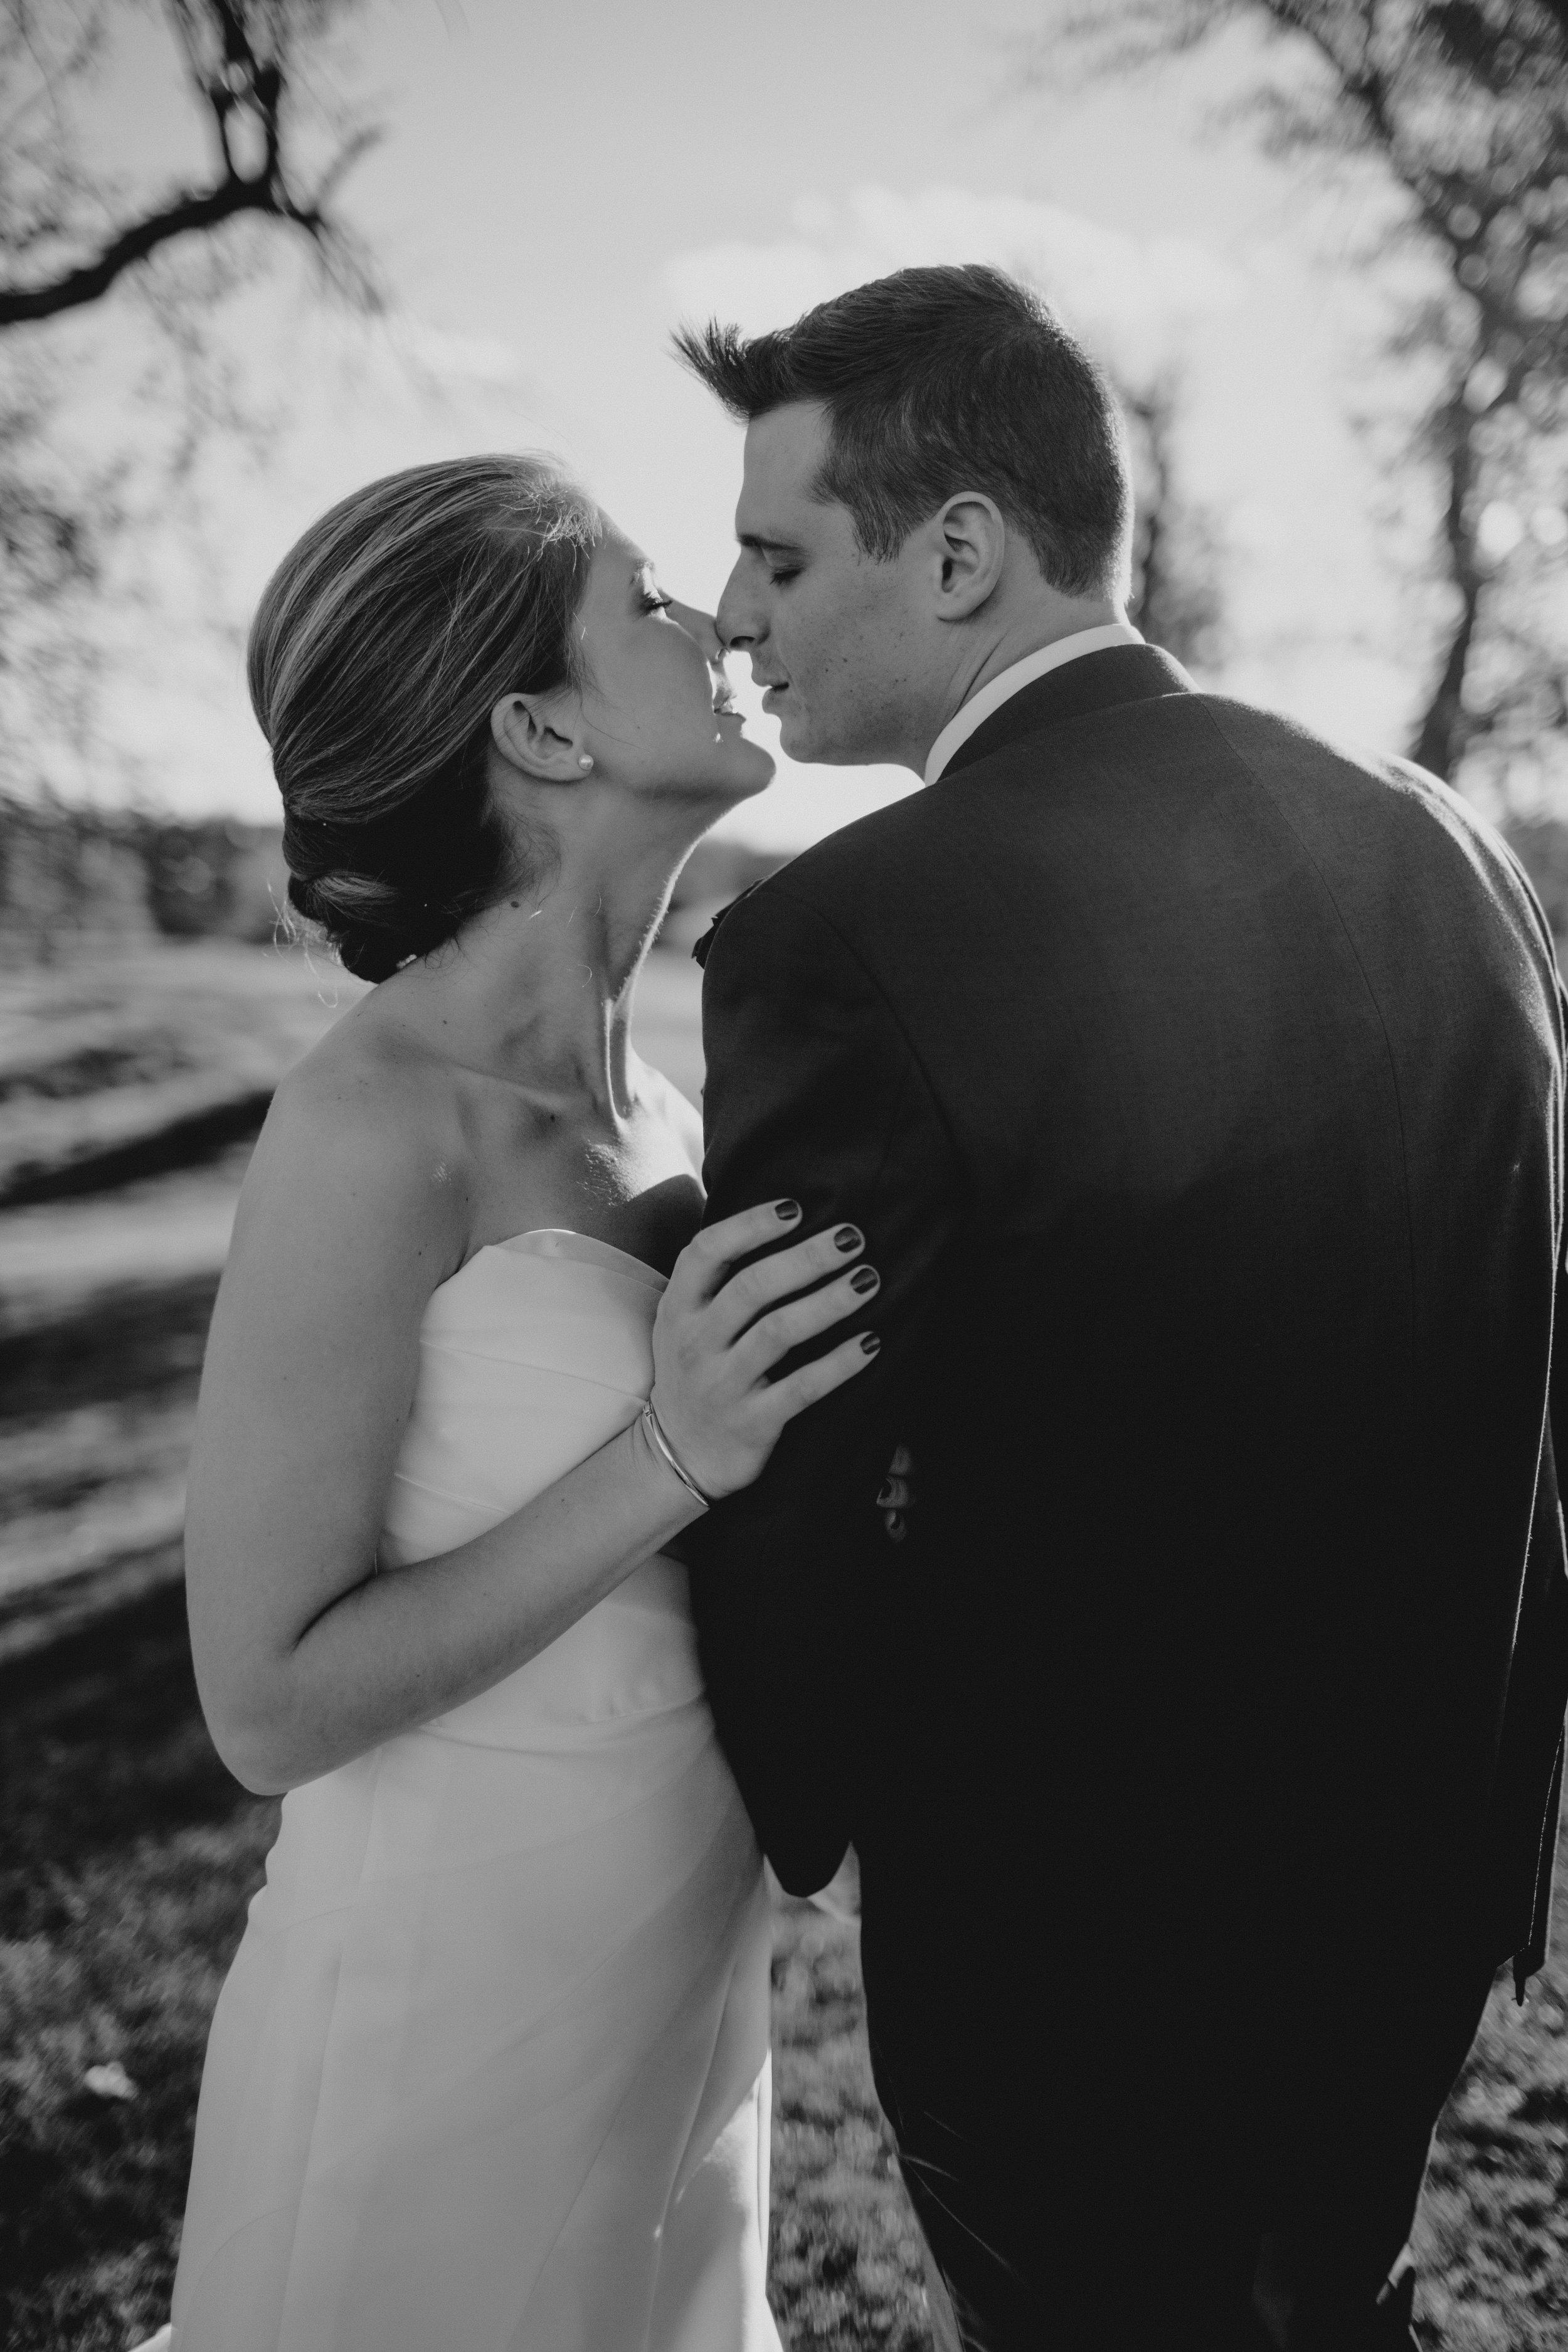 Jeff-and-Leslie-Wedding -8467-2.jpg